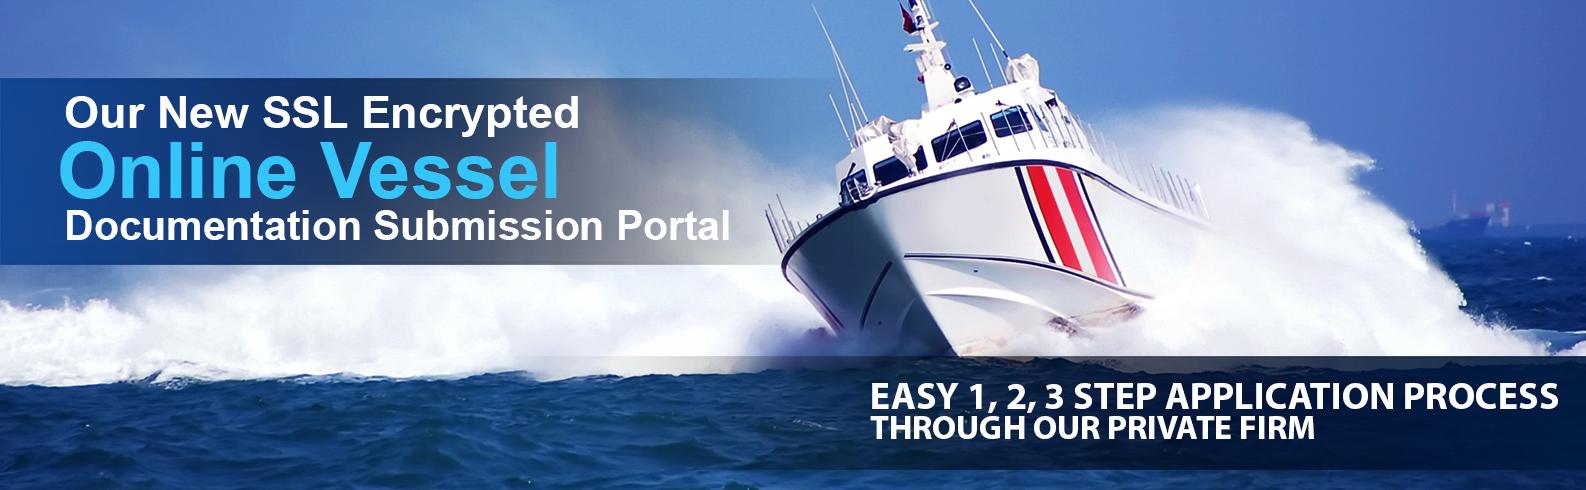 vessel documentation online